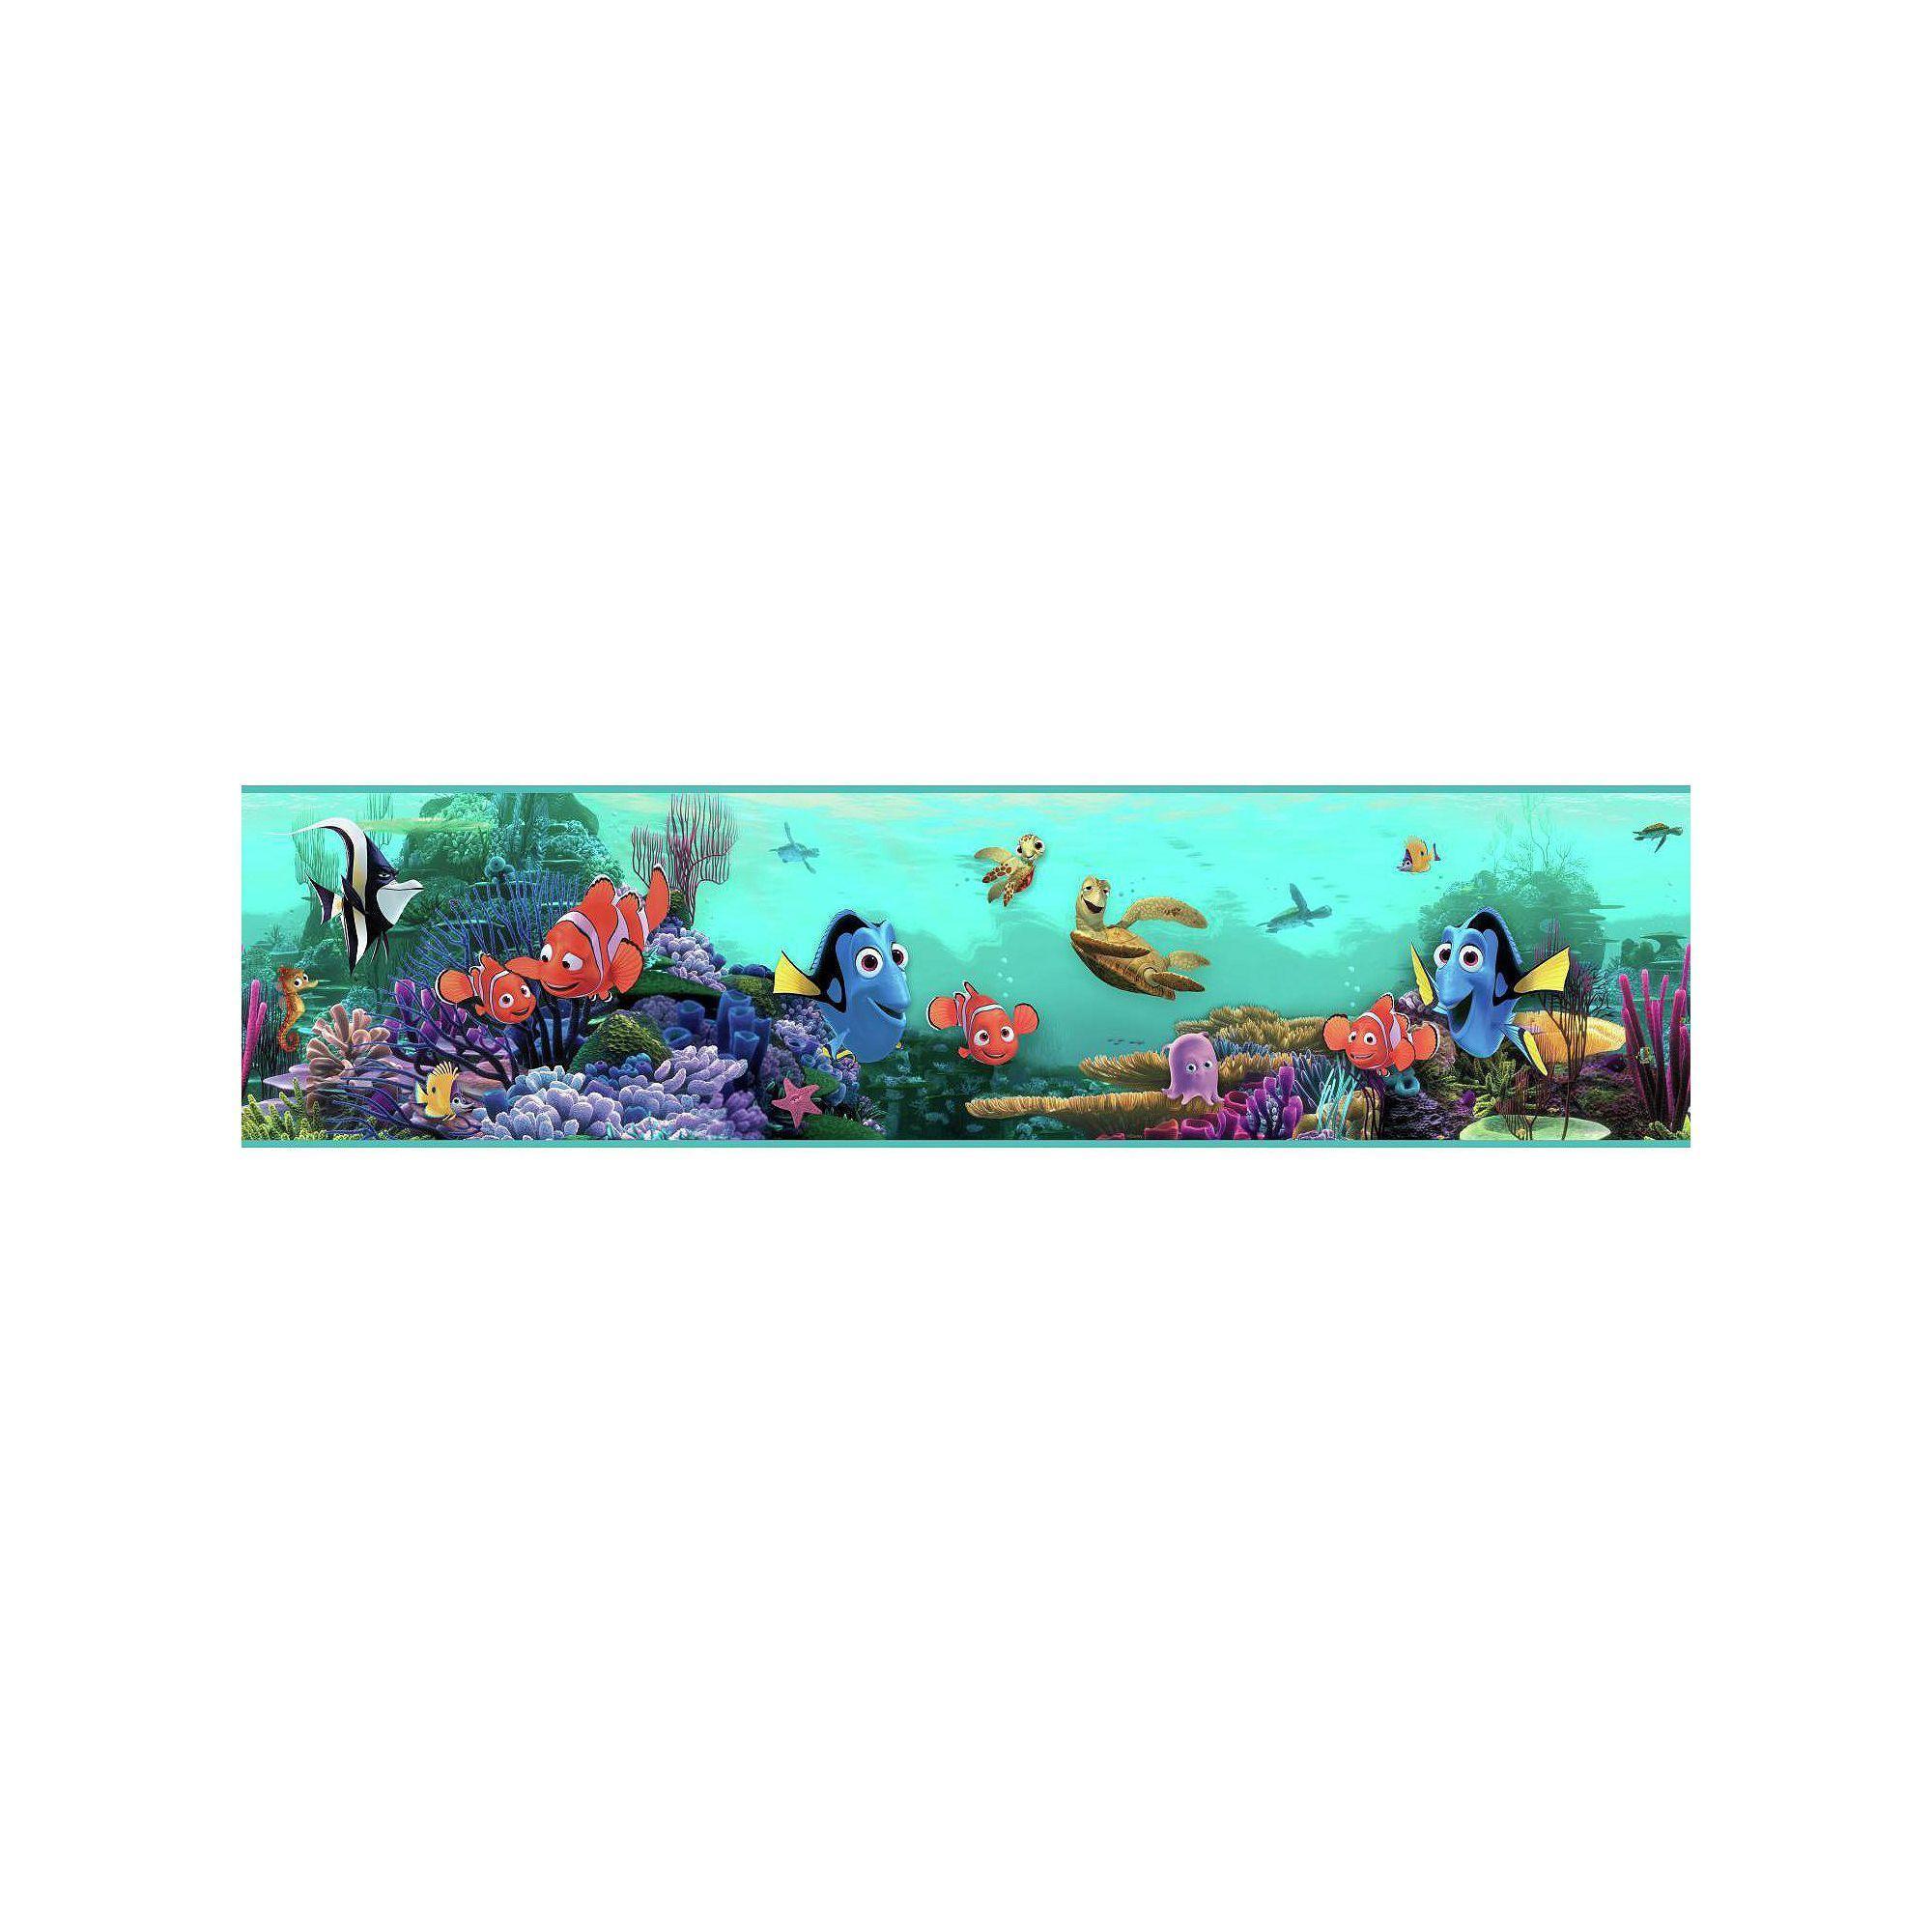 Disney Pixar Finding Nemo Underwater Wall Border Blue